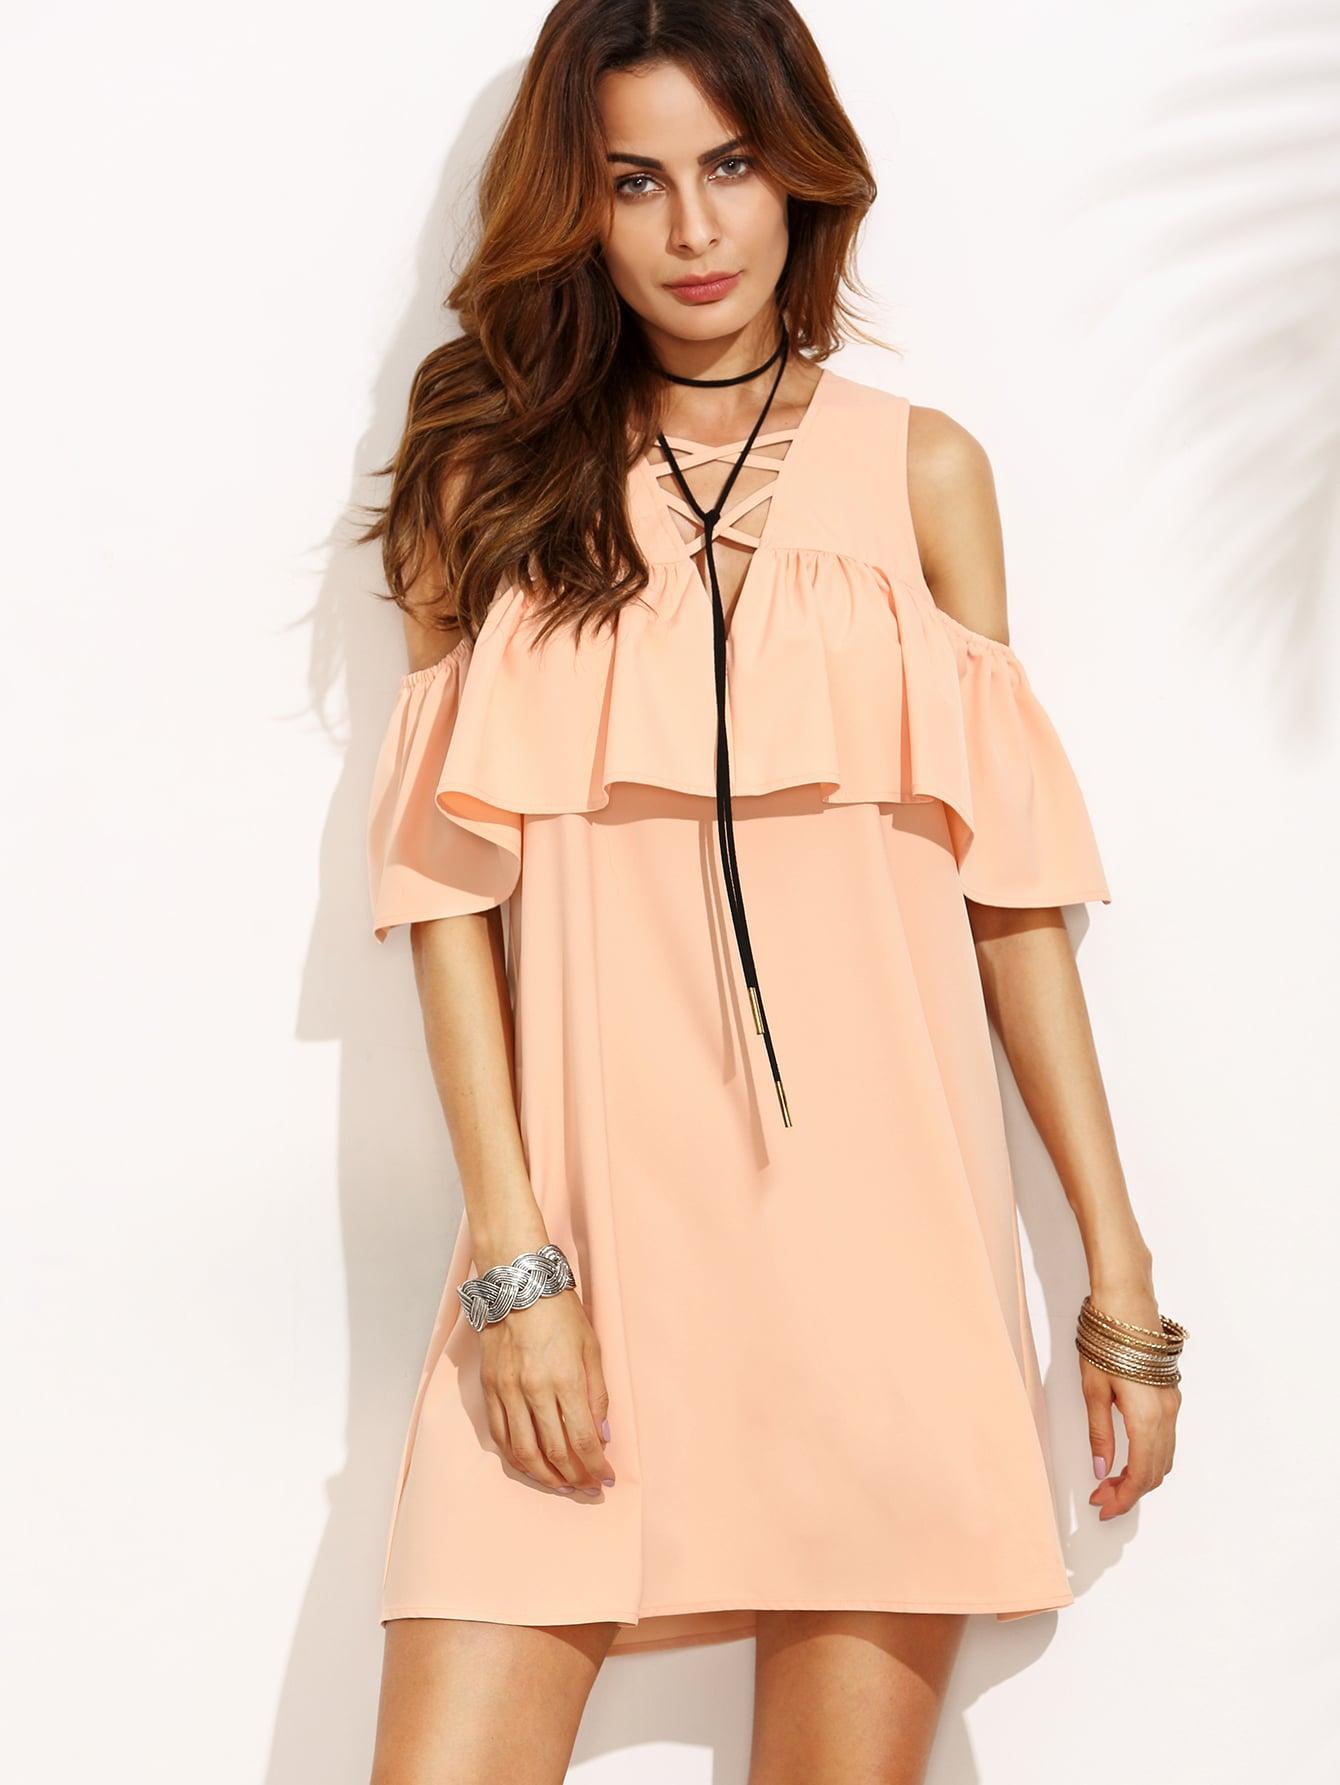 Pink Cold Shoulder Ruffle Criss Cross V Neck Dress dress160802506